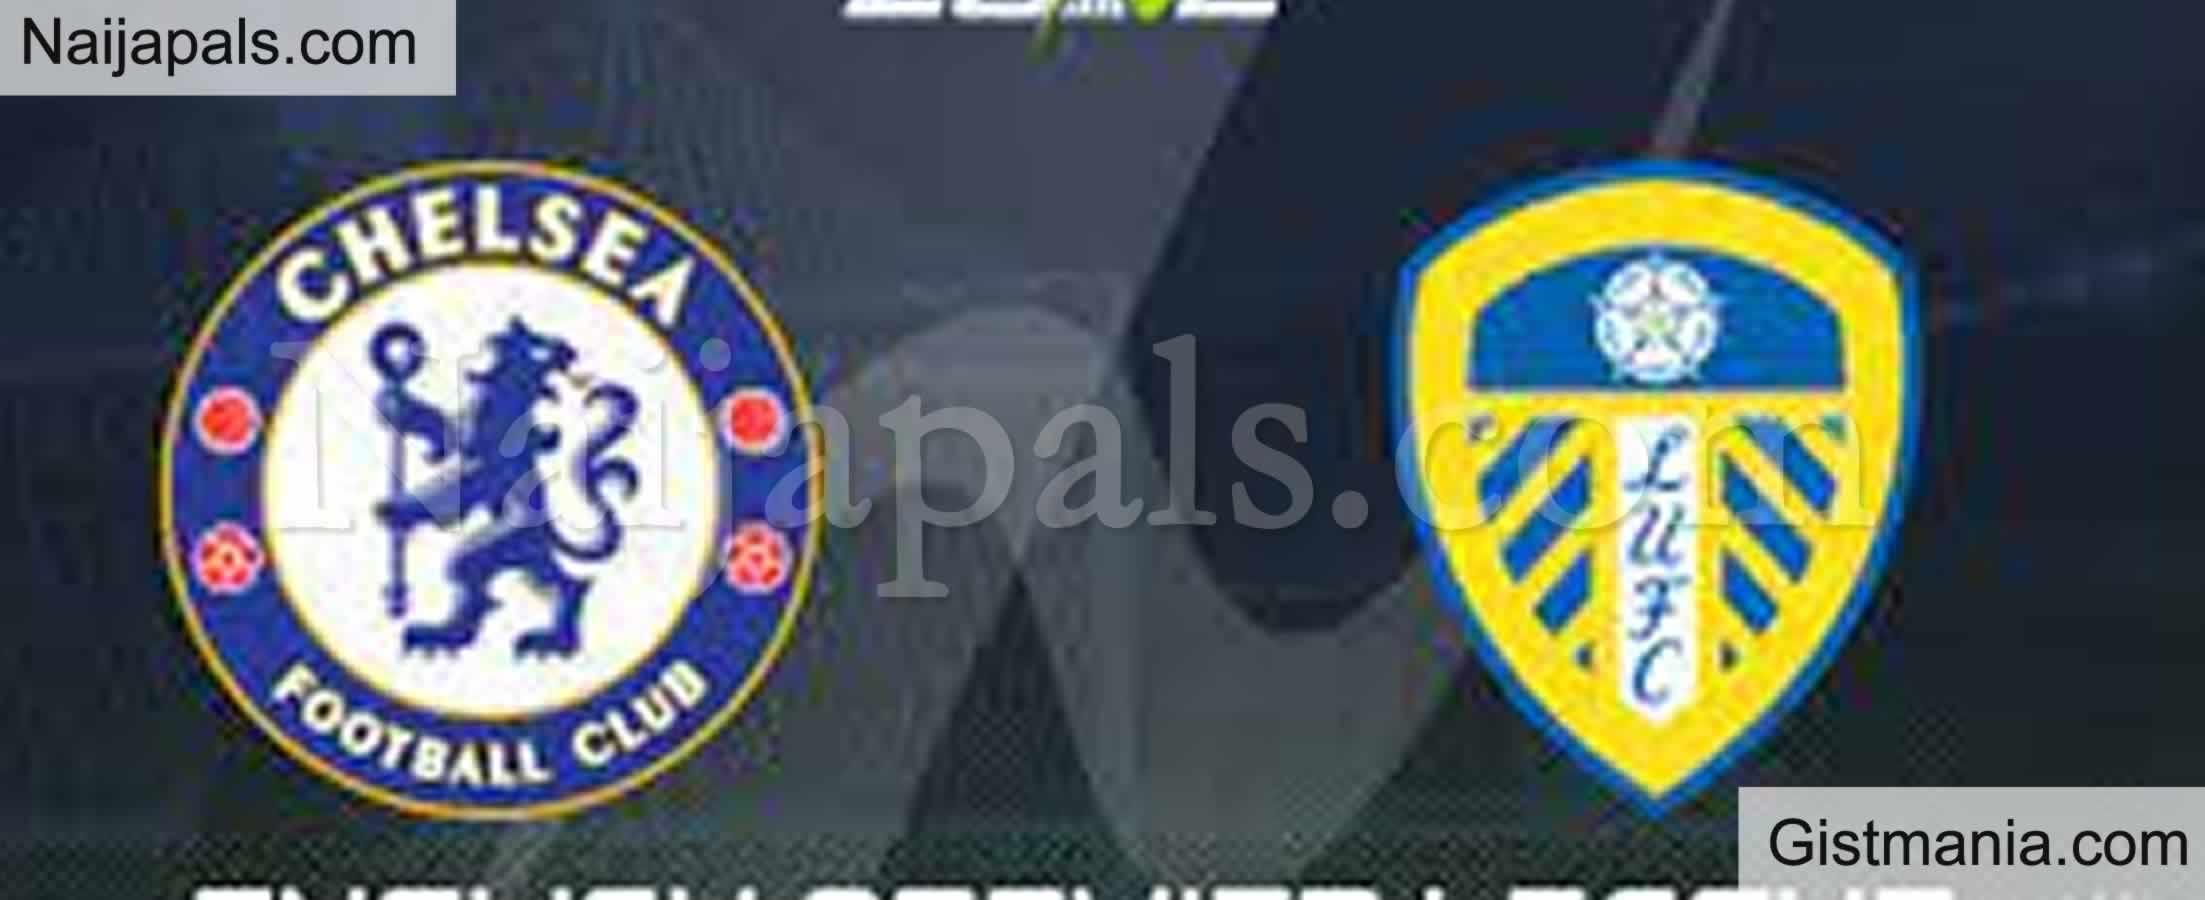 <img alt='.' class='lazyload' data-src='https://img.gistmania.com/emot/soccer.gif' /> <b>Chelsea v Leeds : English Premier League Match, Team News, Goal Scorers and Stats</b>